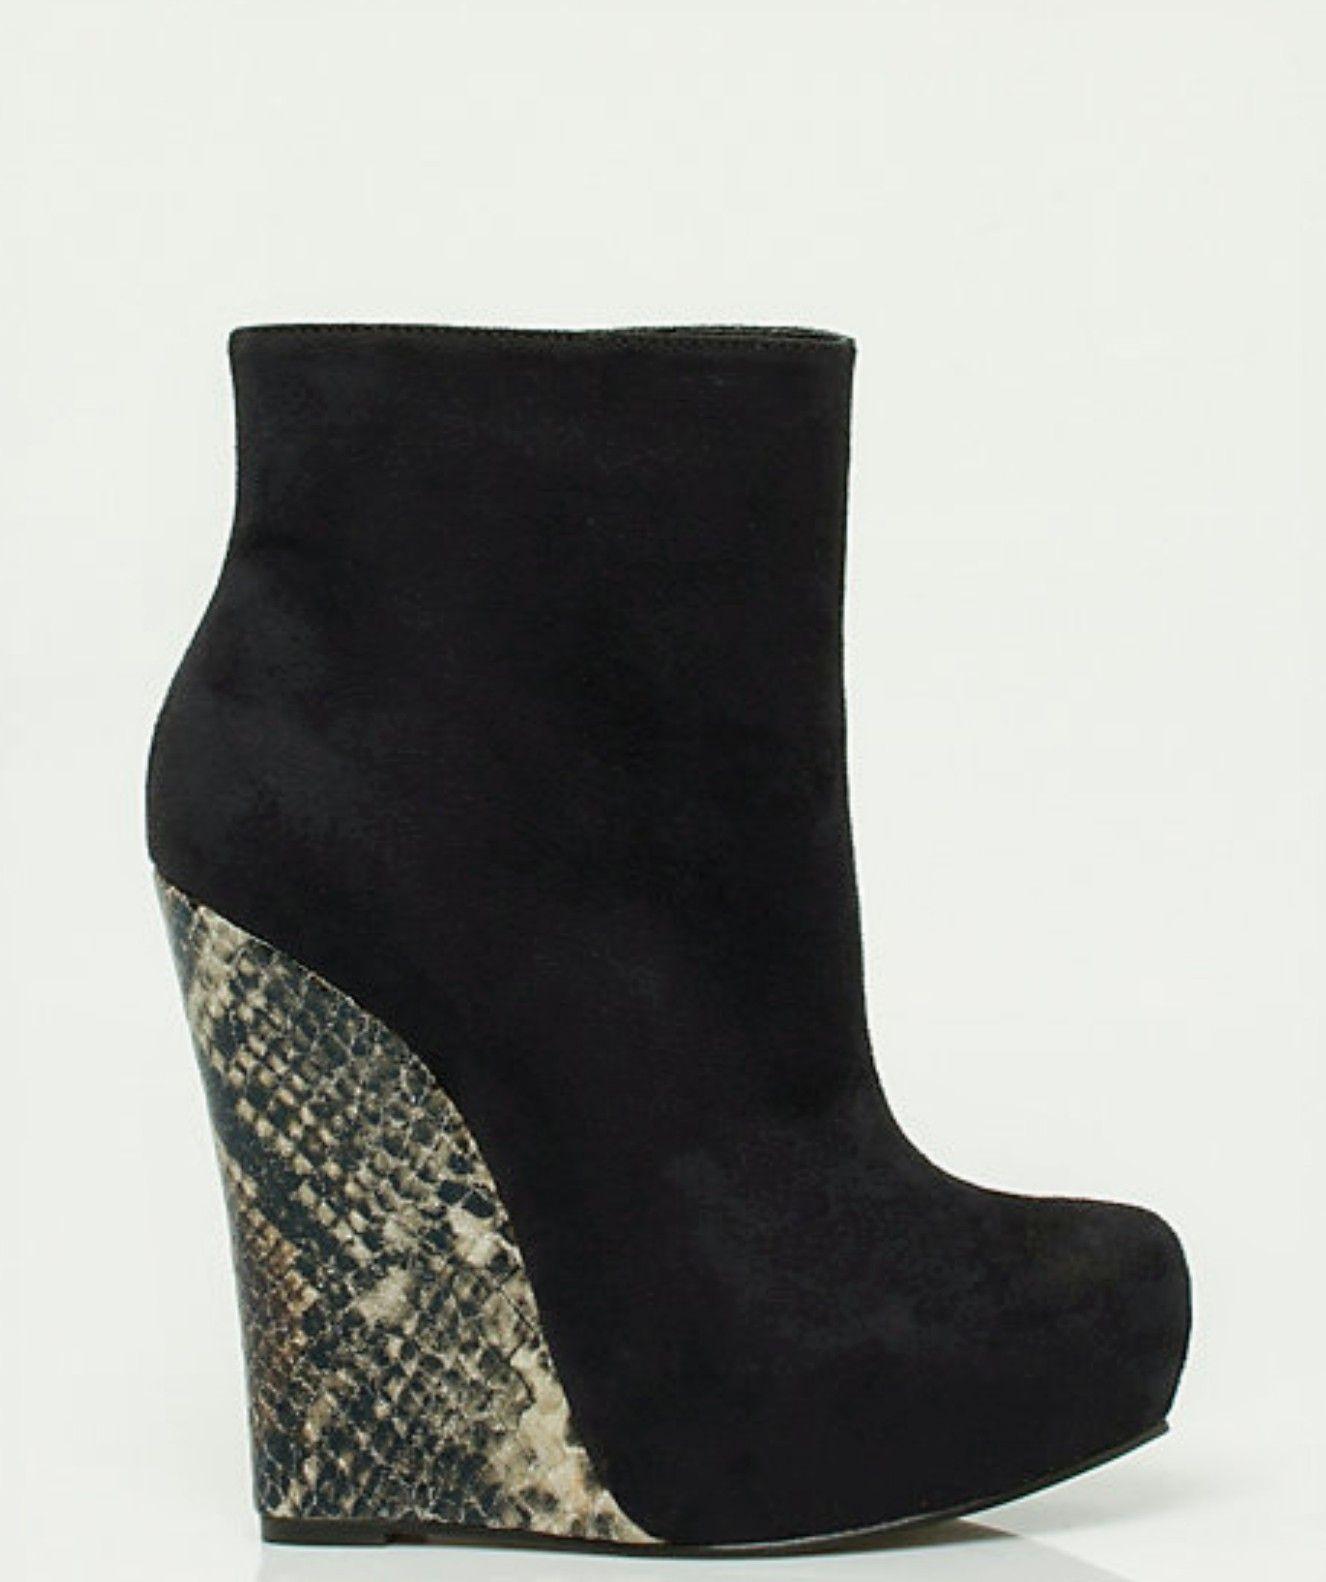 e56b6830bdb Le Château Funky Shoes